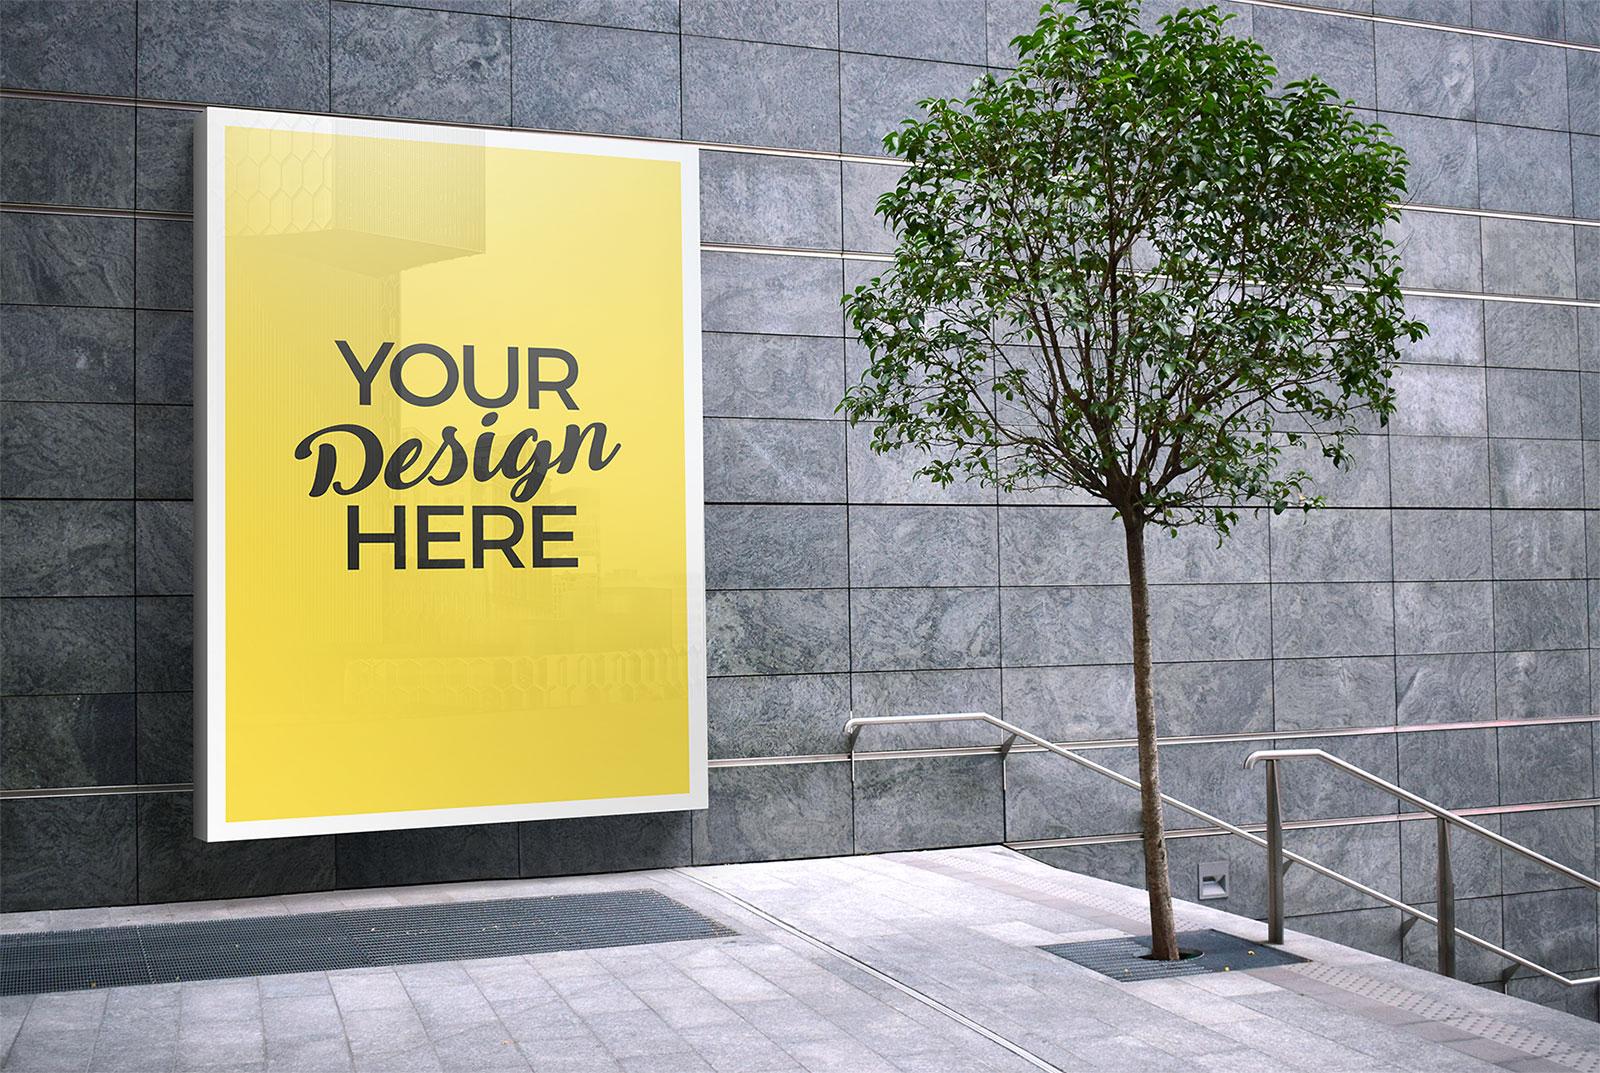 Free Outdoor Advertising Wall Mounted Billboard Mockup PSD ...